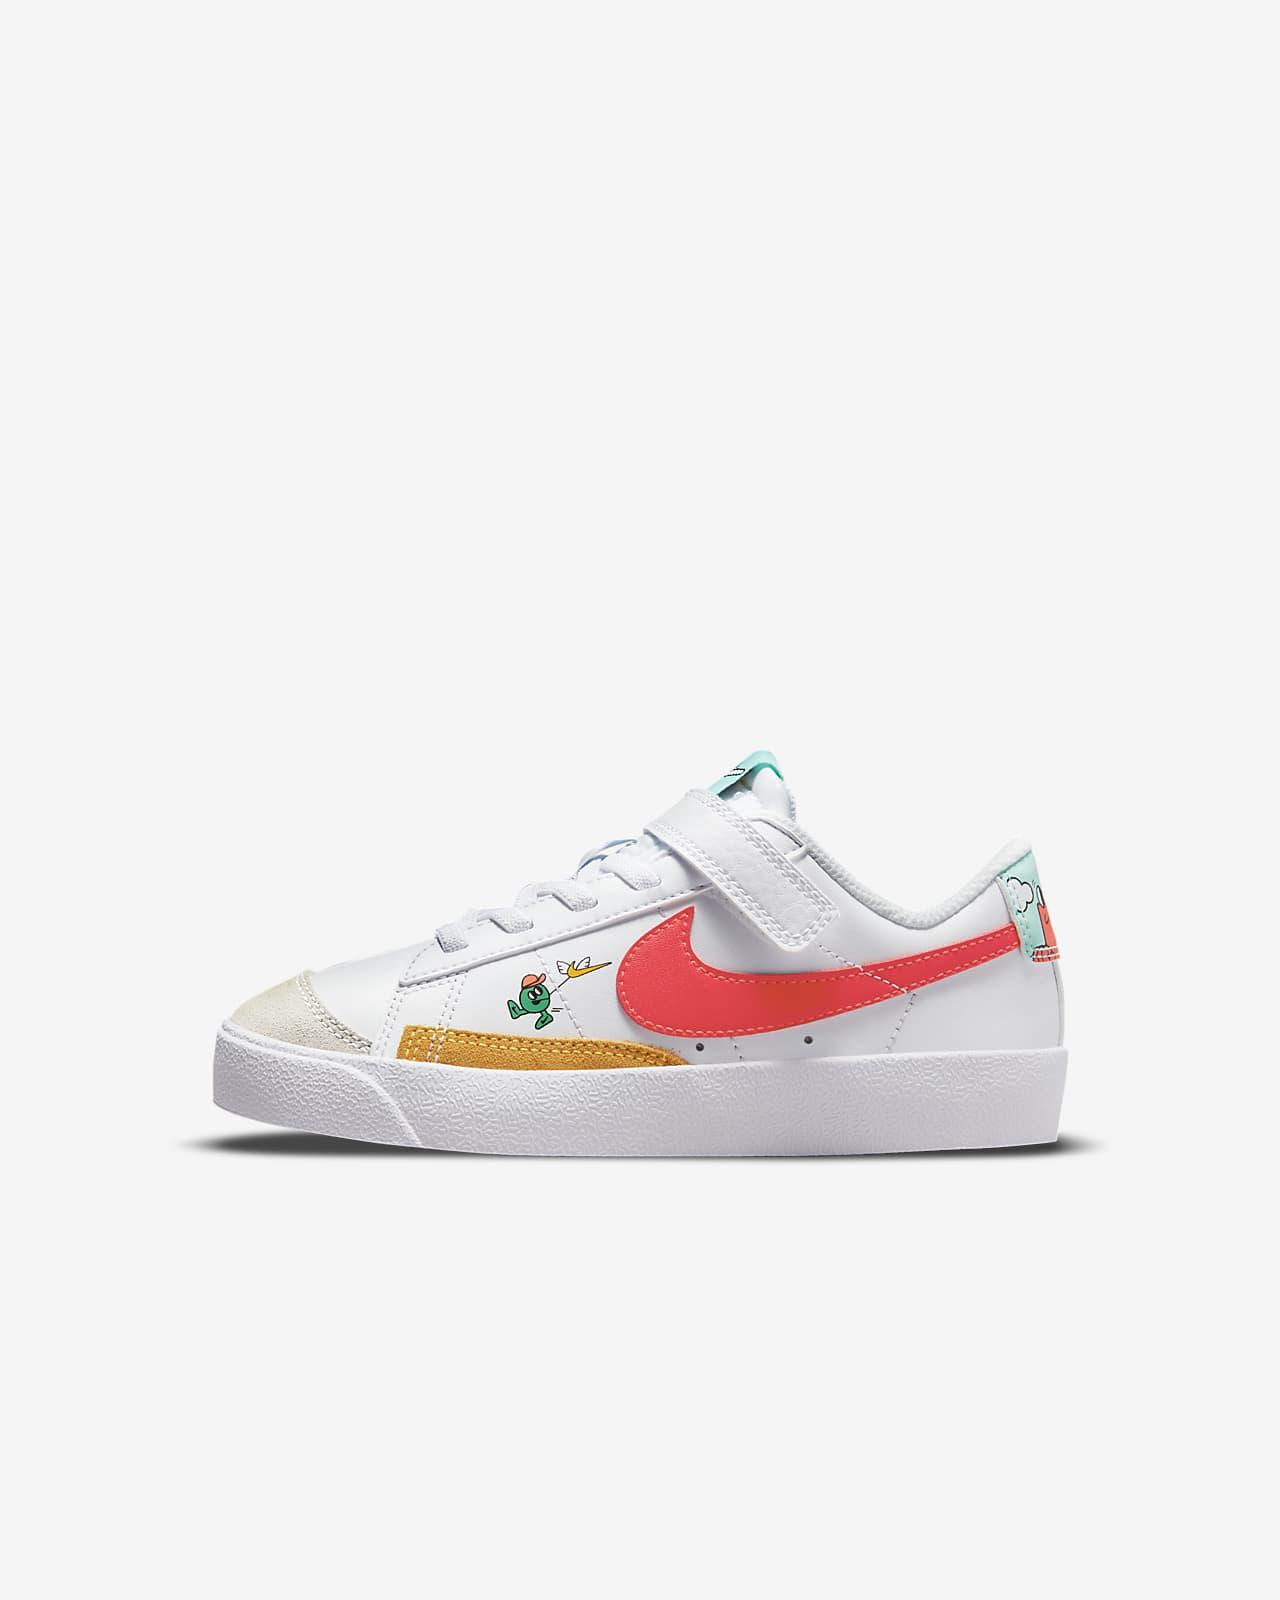 Nike Blazer Low '77 BP 幼童运动童鞋